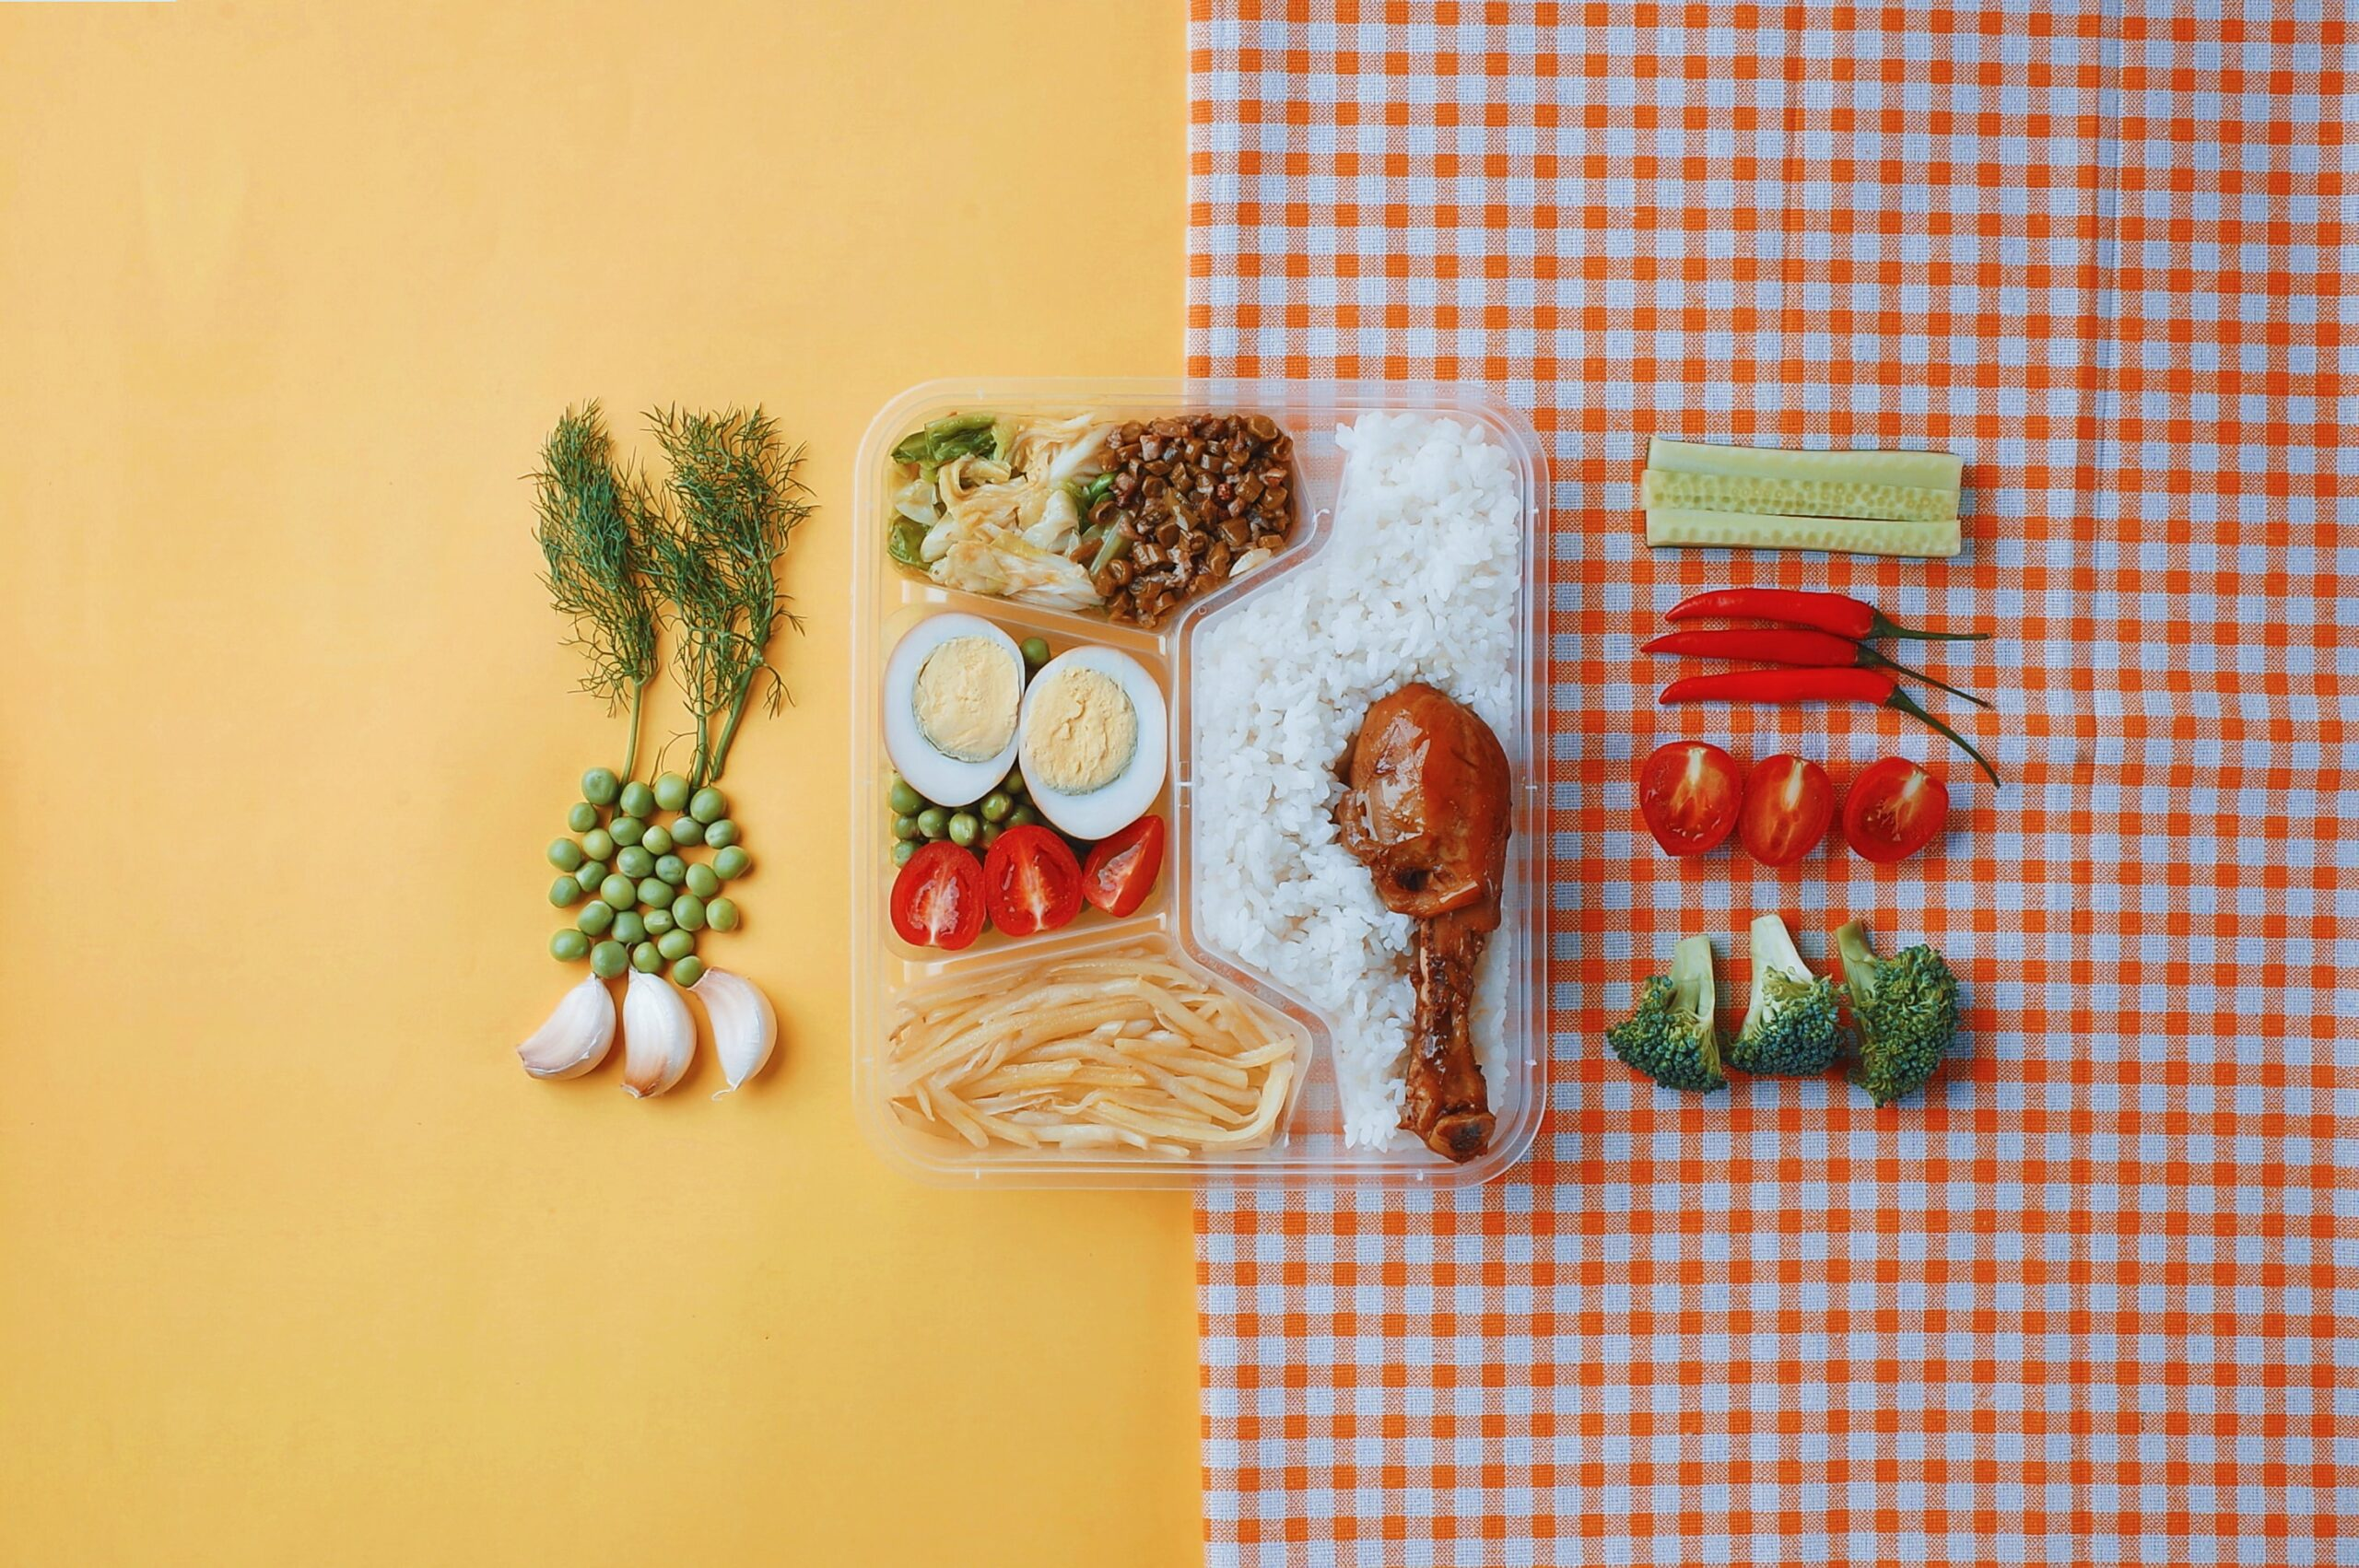 nosh(ナッシュ)冷凍宅配弁当の口コミ評判|ダイエットにも効果?